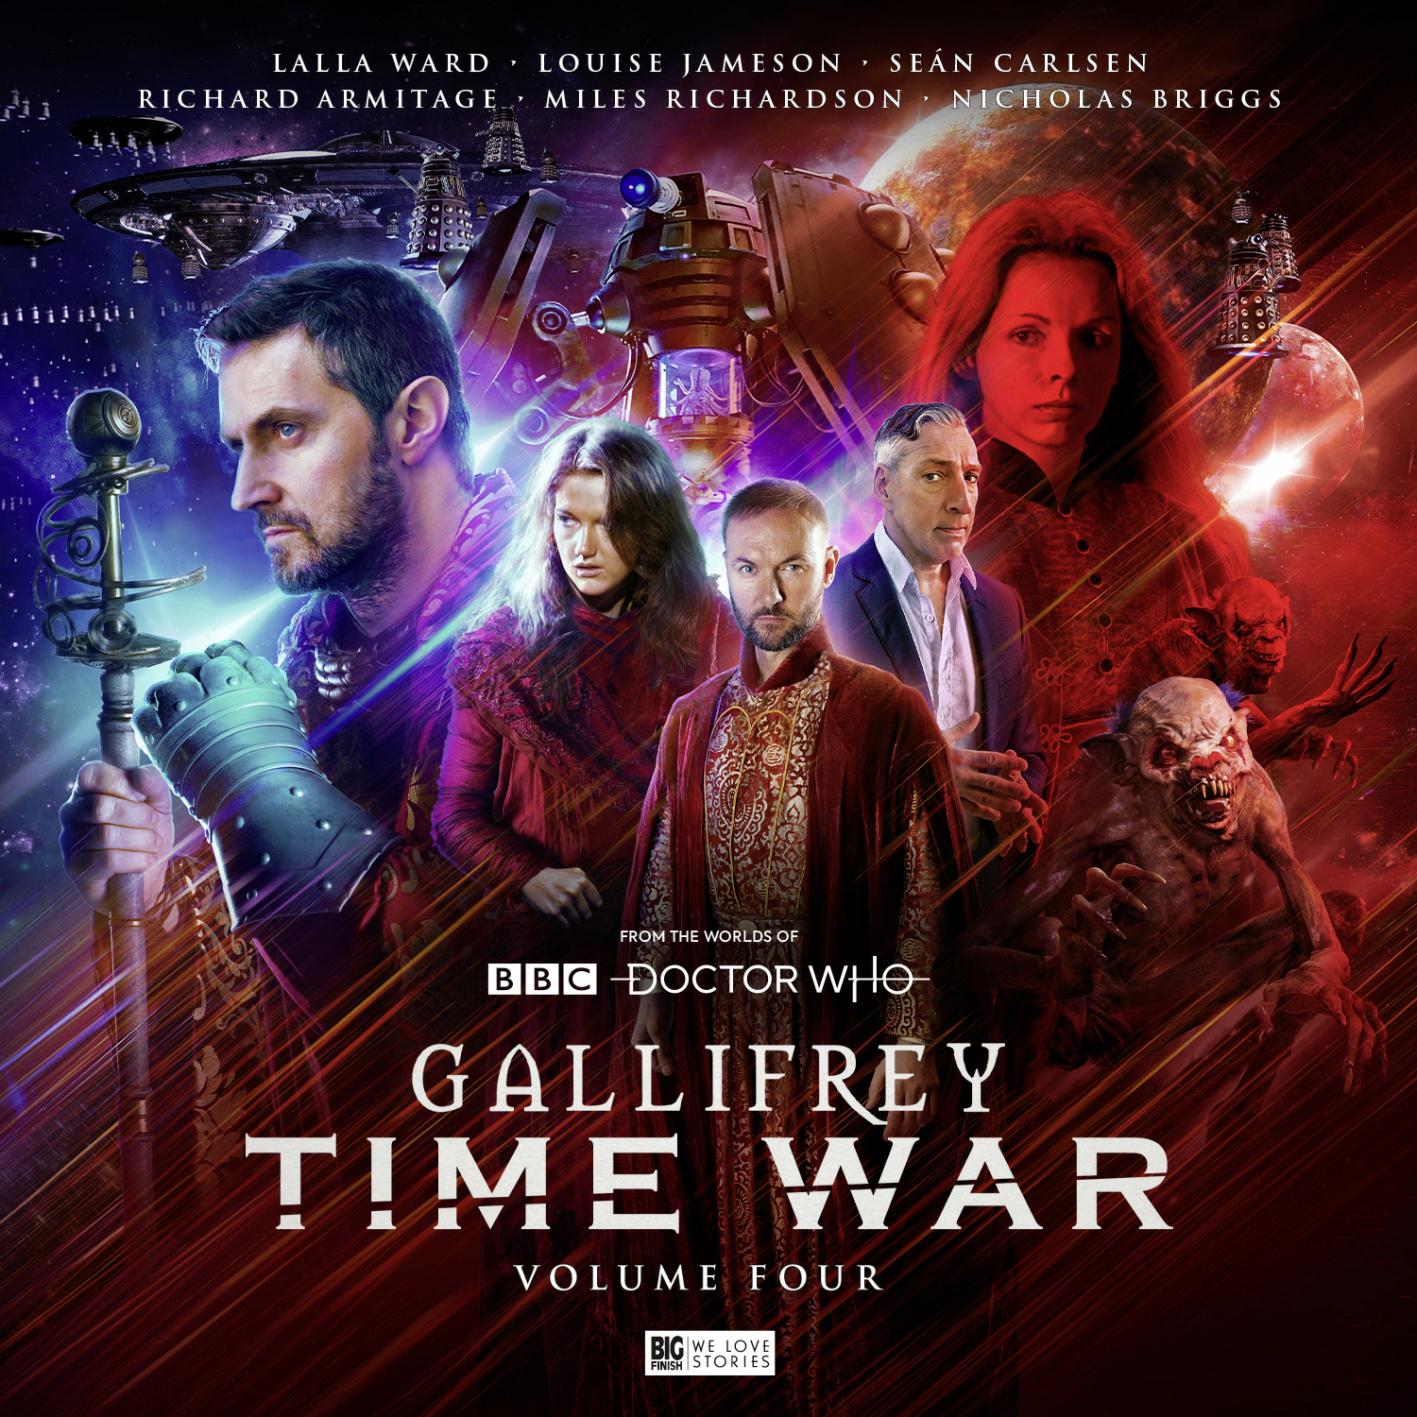 Gallifrey: Time War 4. Cover by Tom Newsom (c) Big Finish Productions Doctor Who Rassilon Leela Romana